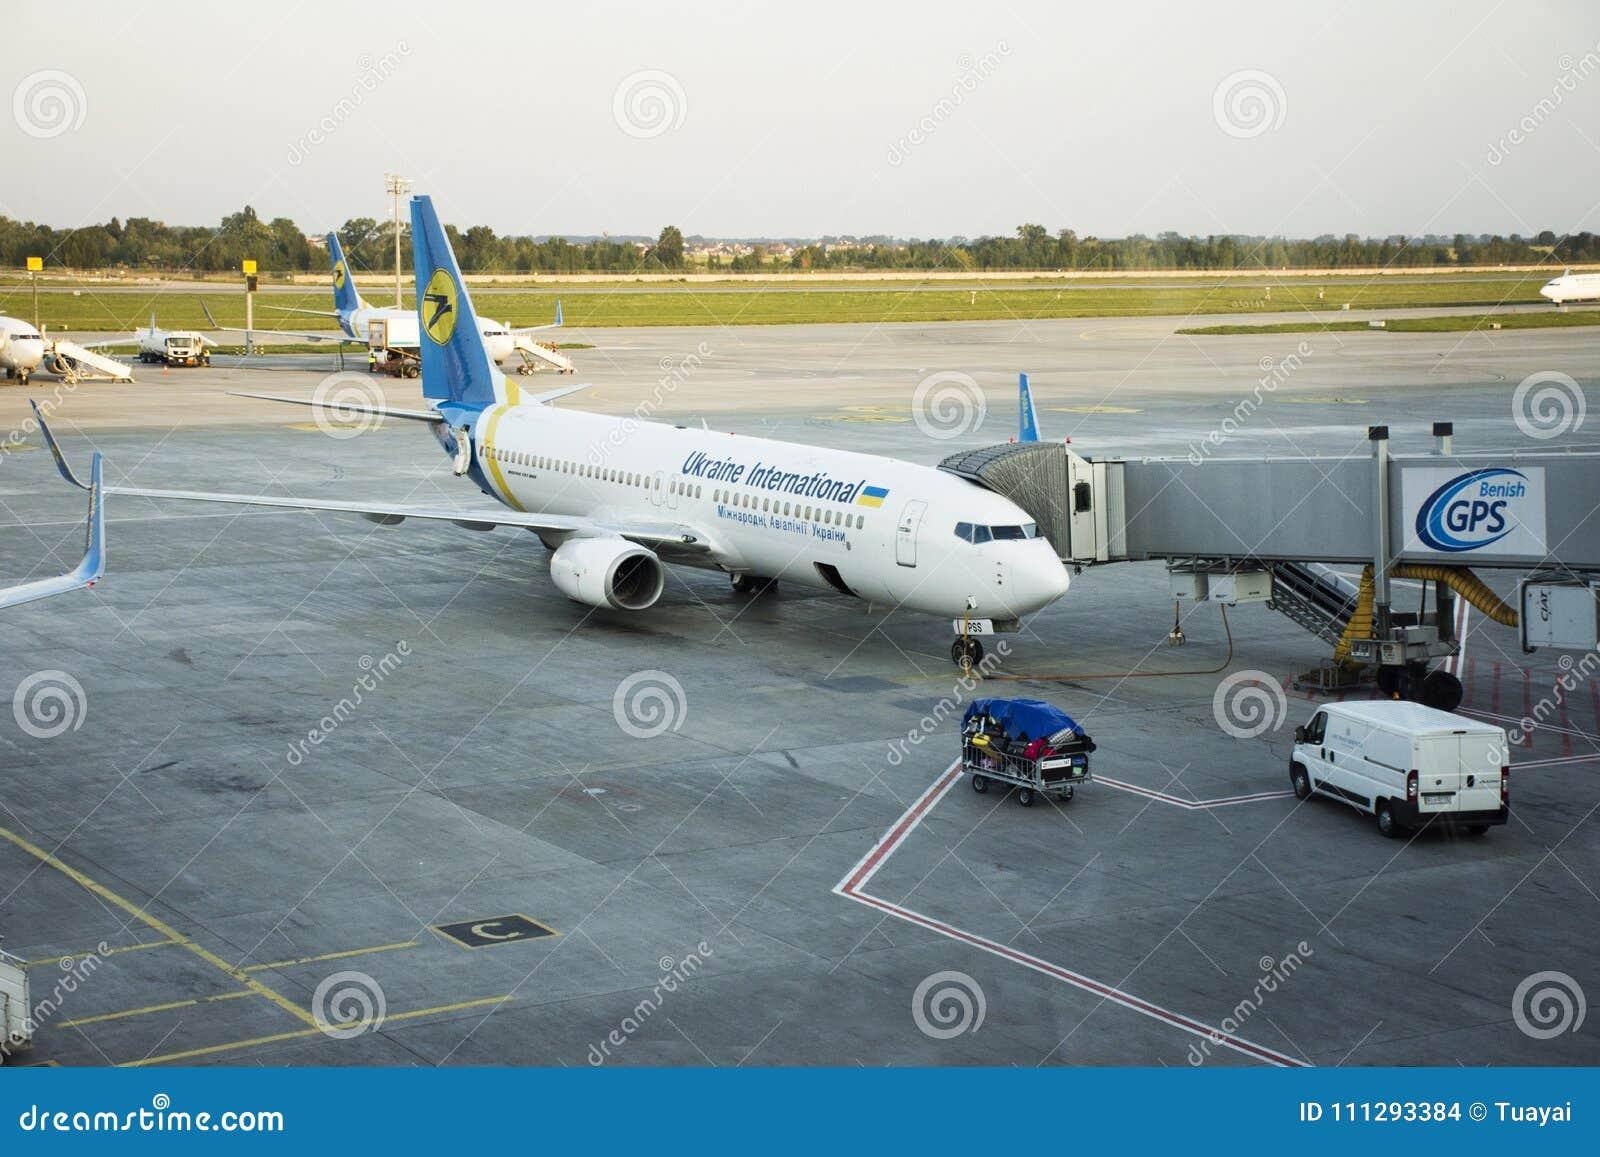 Aeroporto Kiev : Runway of kiev boryspil international airport at kiev ukraine